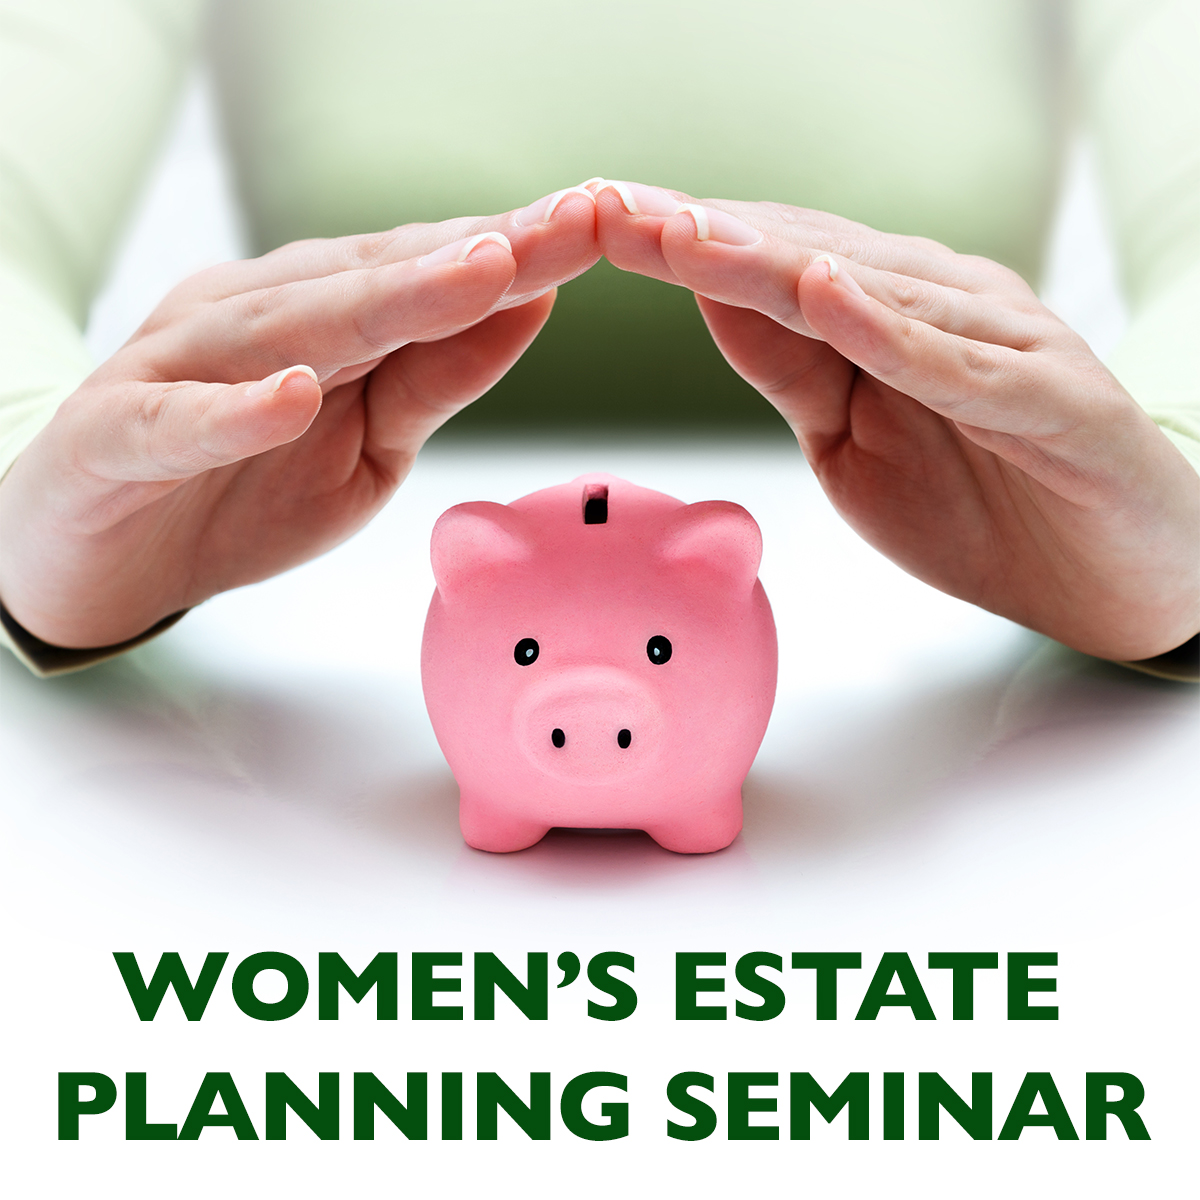 Women's Estate Planning Seminar